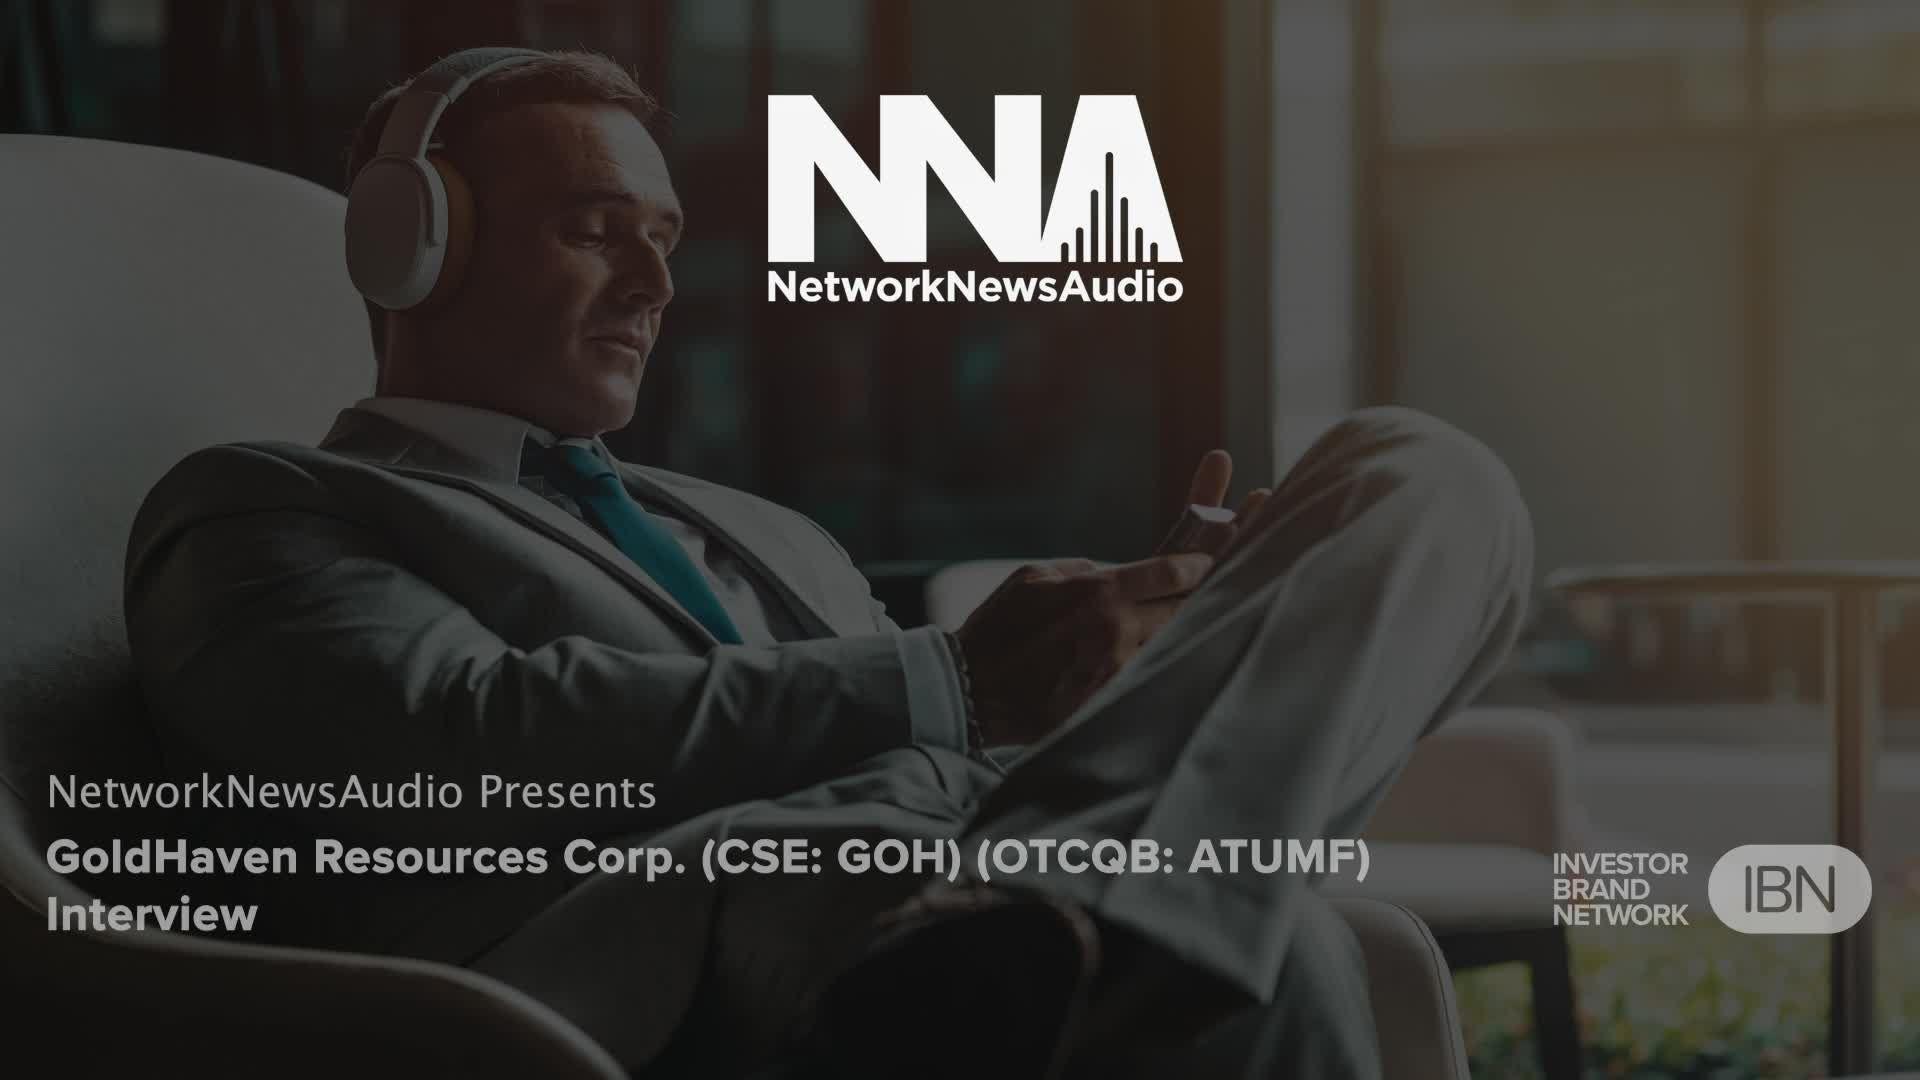 InvestorBrandNetwork-NetworkNewsAudio Interviews-GoldHaven Resources Corp. (CSE: GOH) (OTCQB: GHVNF) Interview